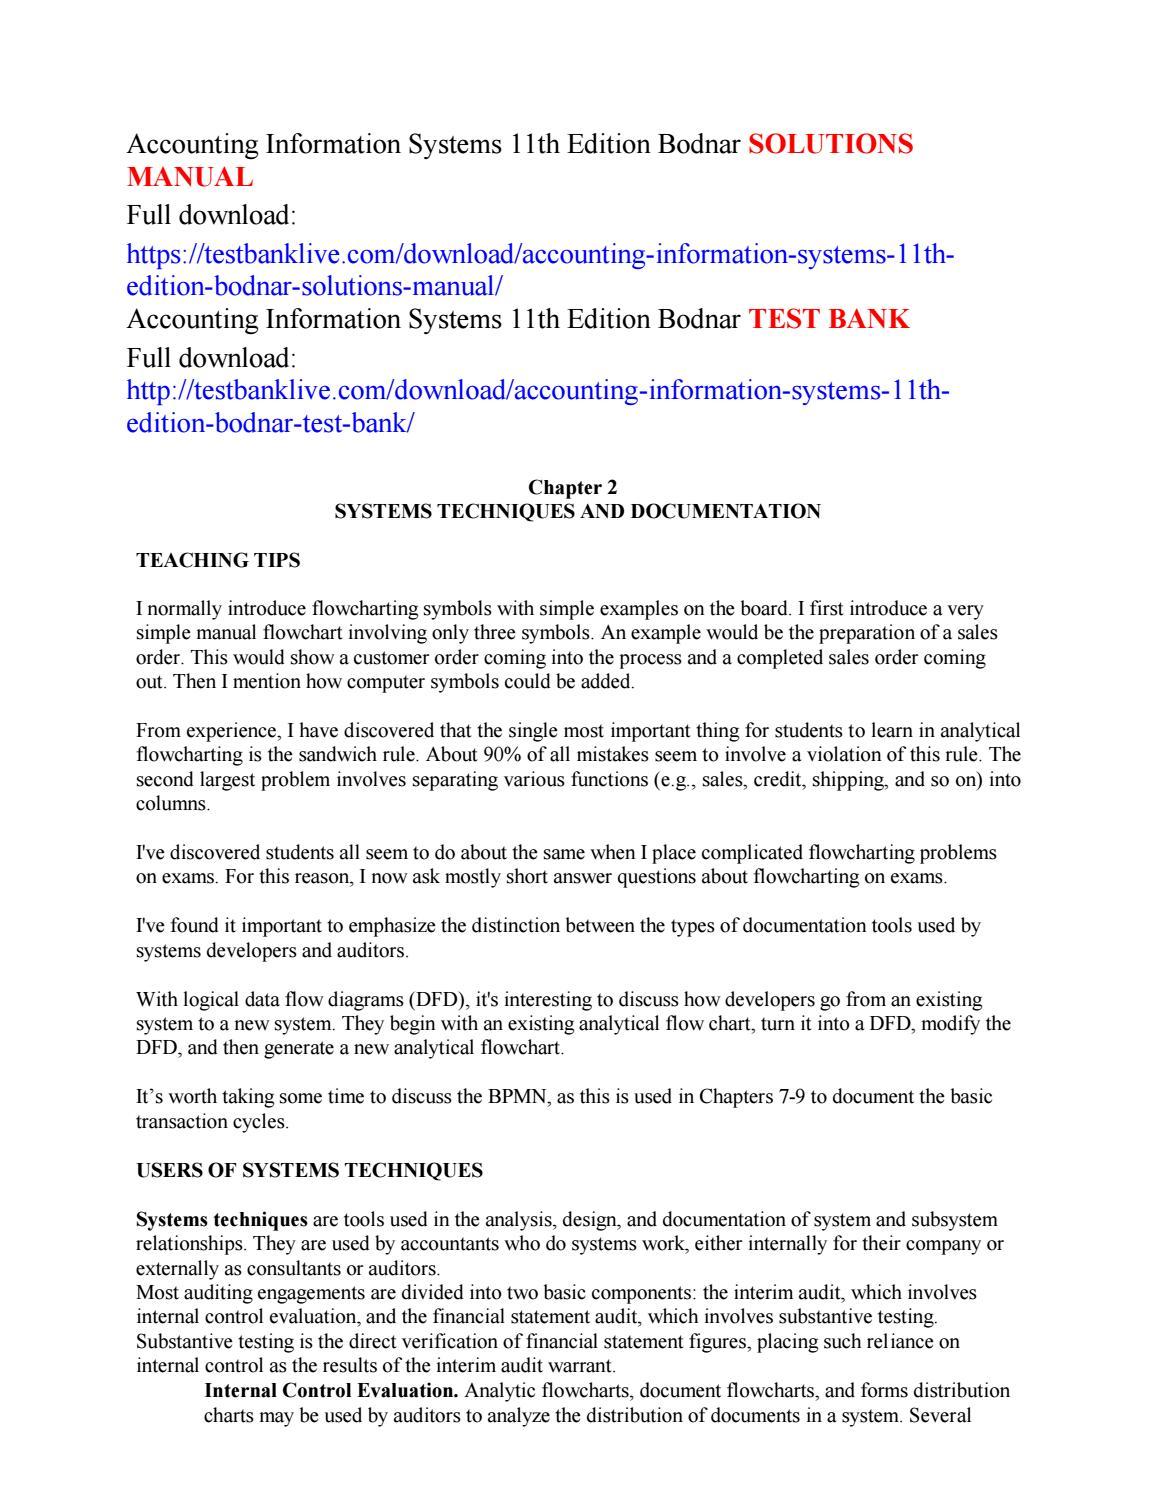 Accounting Information Systems 11th Edition Bodnar Solutions Manual Logic Flow Diagram Symbols By Garenni Issuu